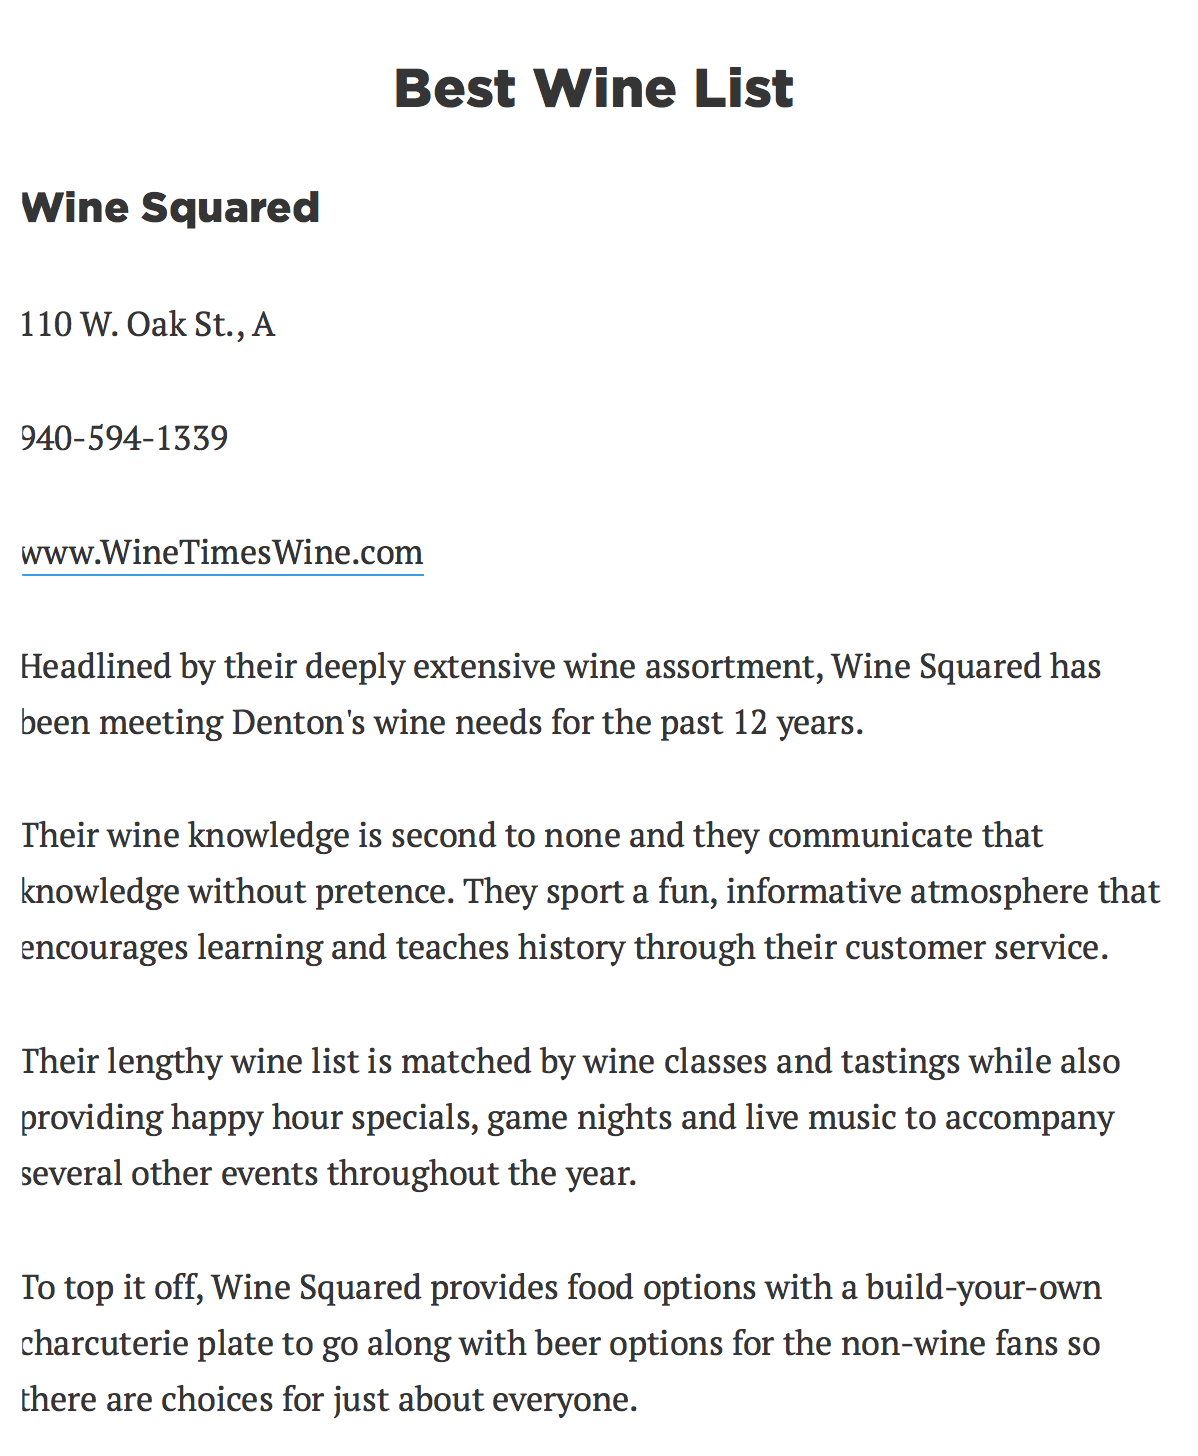 Best Wine List in Denton.png